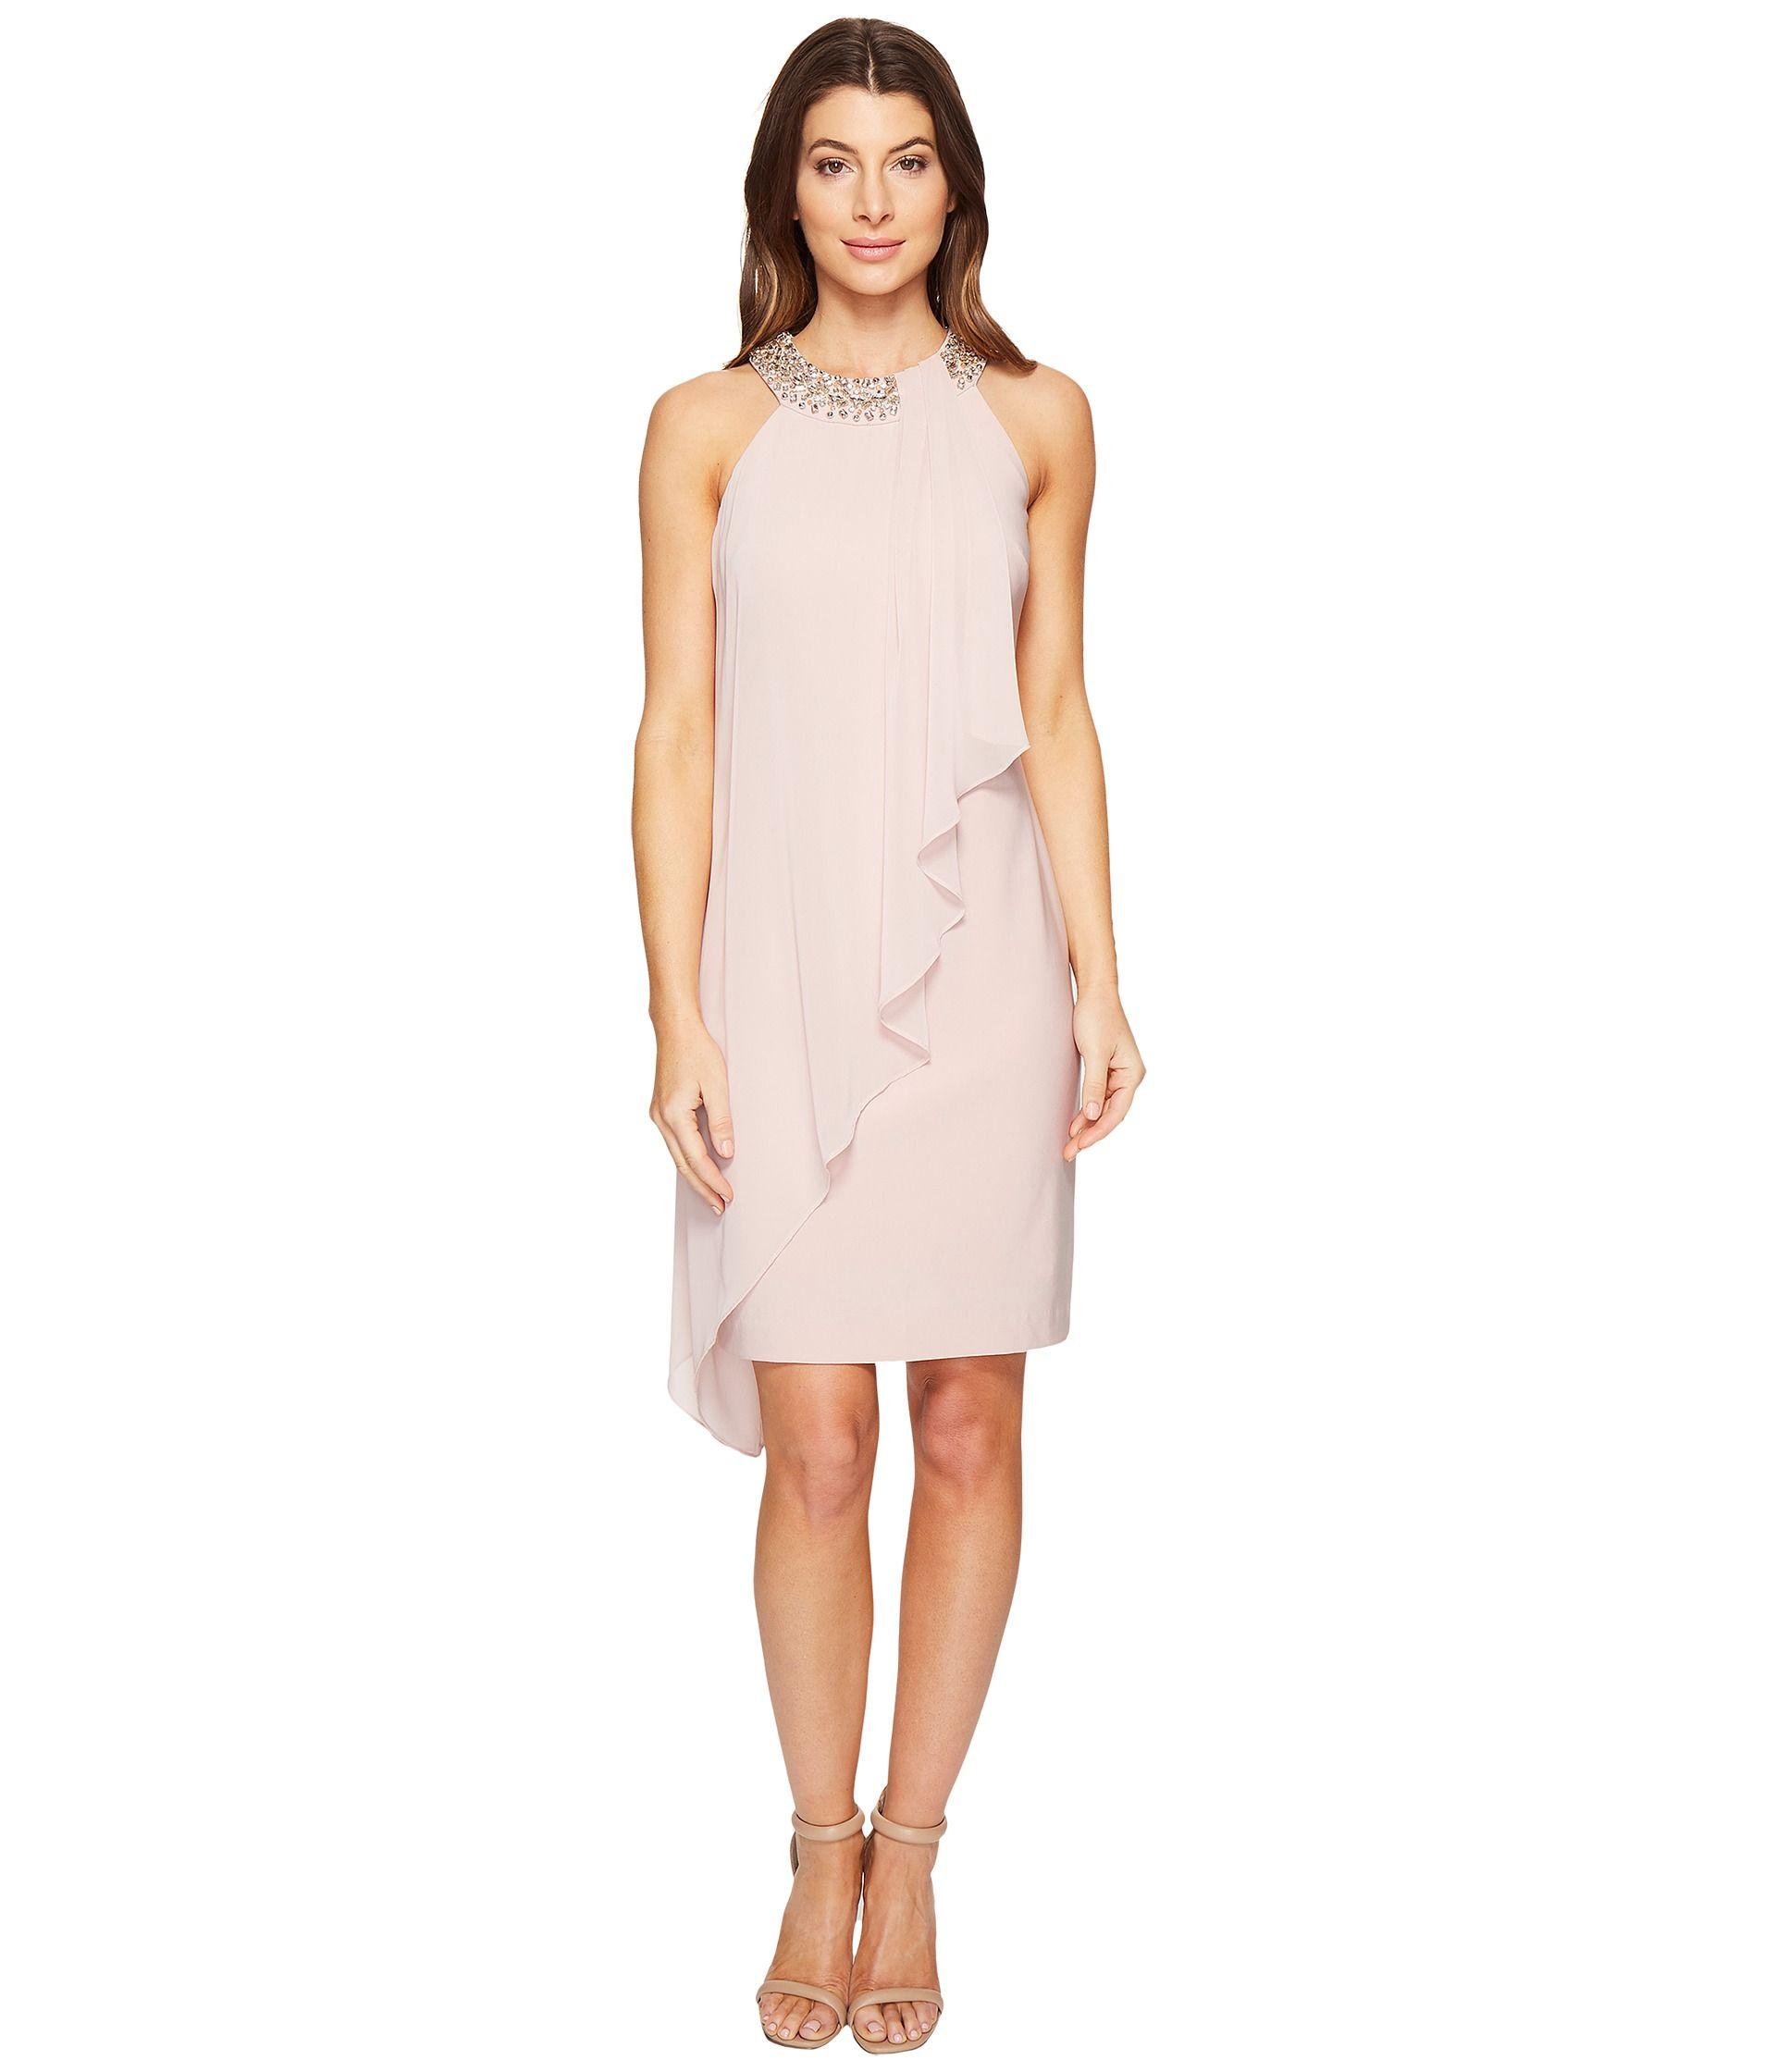 Cora Skinner Zappos 2017 Pink Womens Dresses Dresses Womens Dresses [ 2240 x 1920 Pixel ]